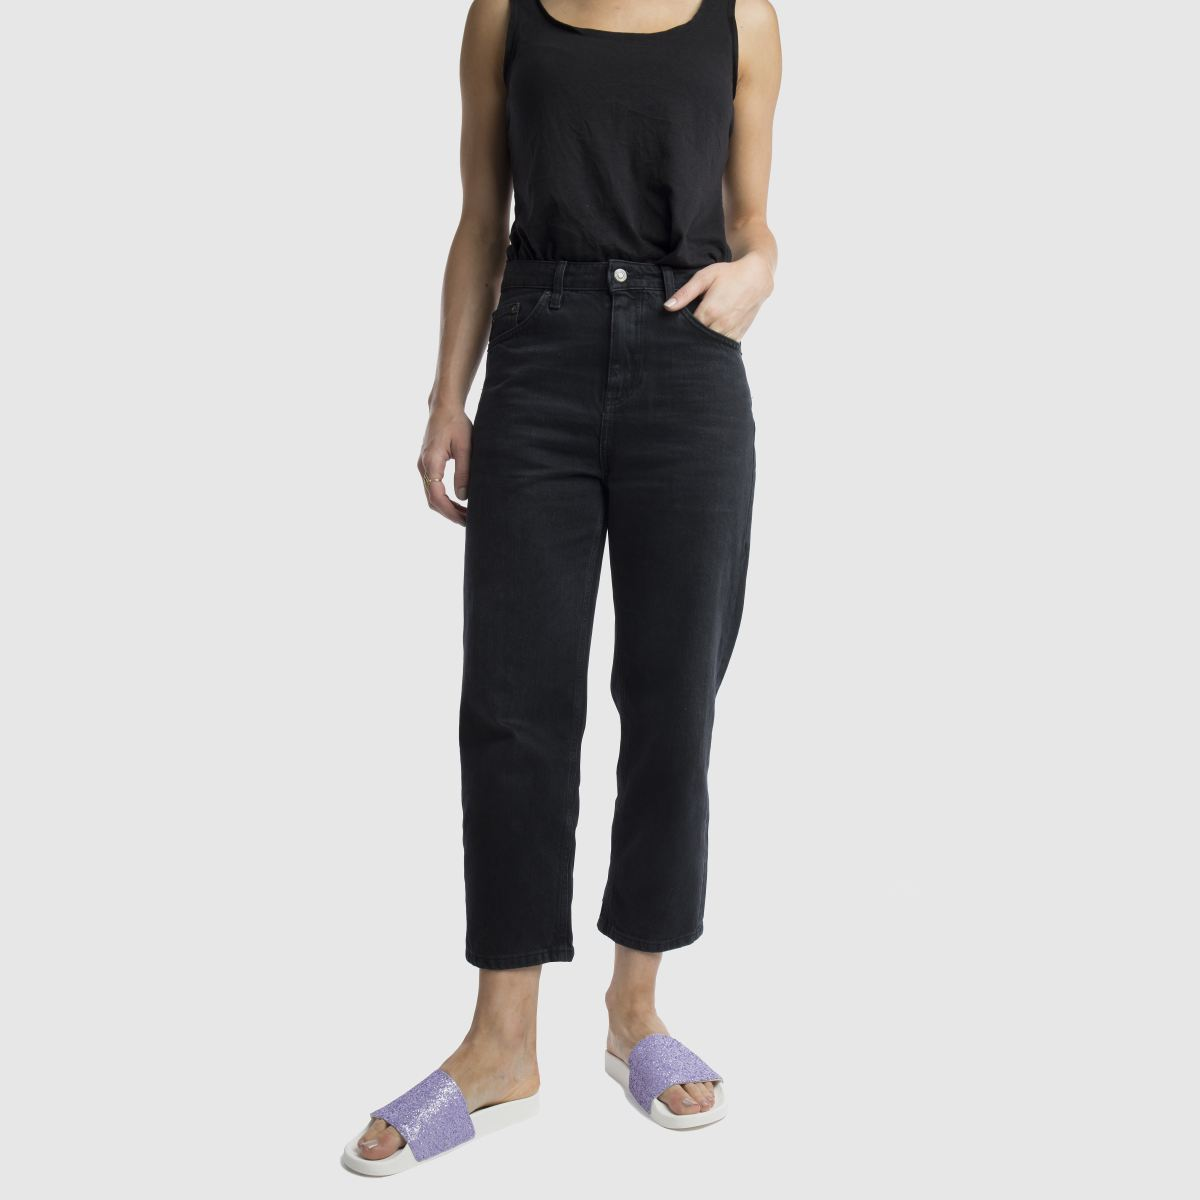 Damen Blaulila Sandalen schuh Proper Boss Slider Sandalen Blaulila | schuh Gute Qualität beliebte Schuhe 8465e3